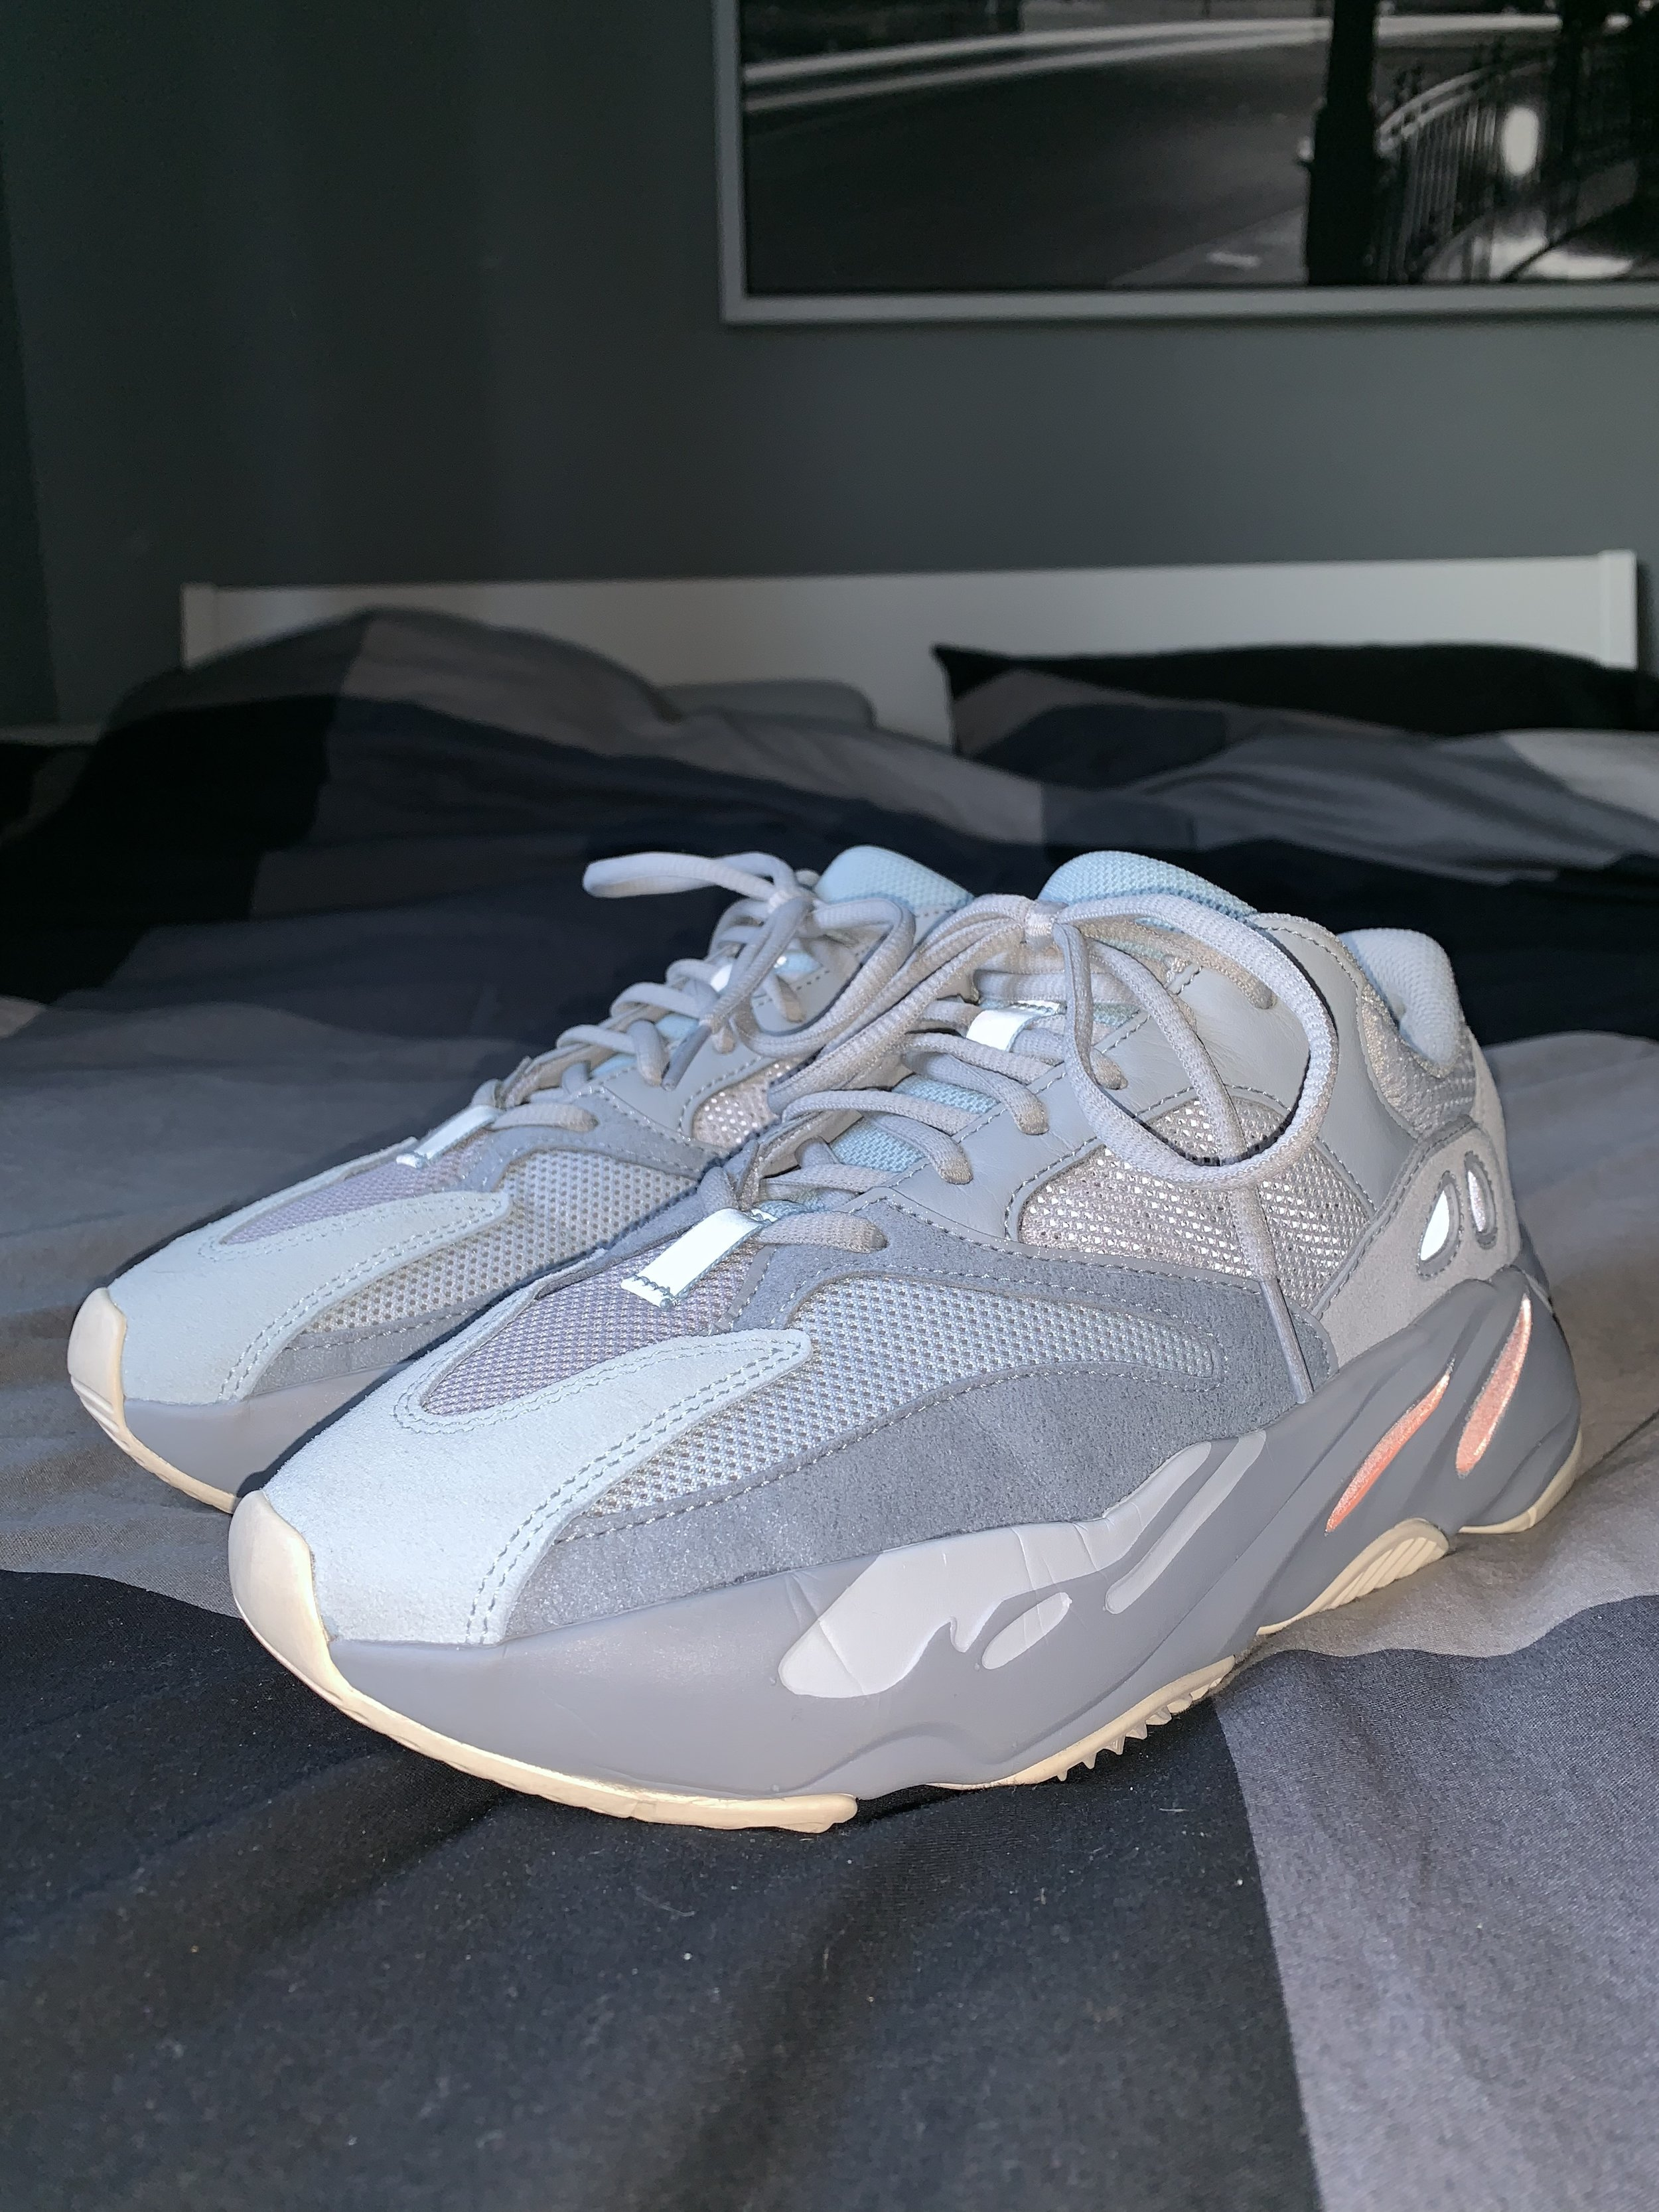 online store bcfec 7698c The Yeezy 700 'Inertia' Review — Rotation Sneakers